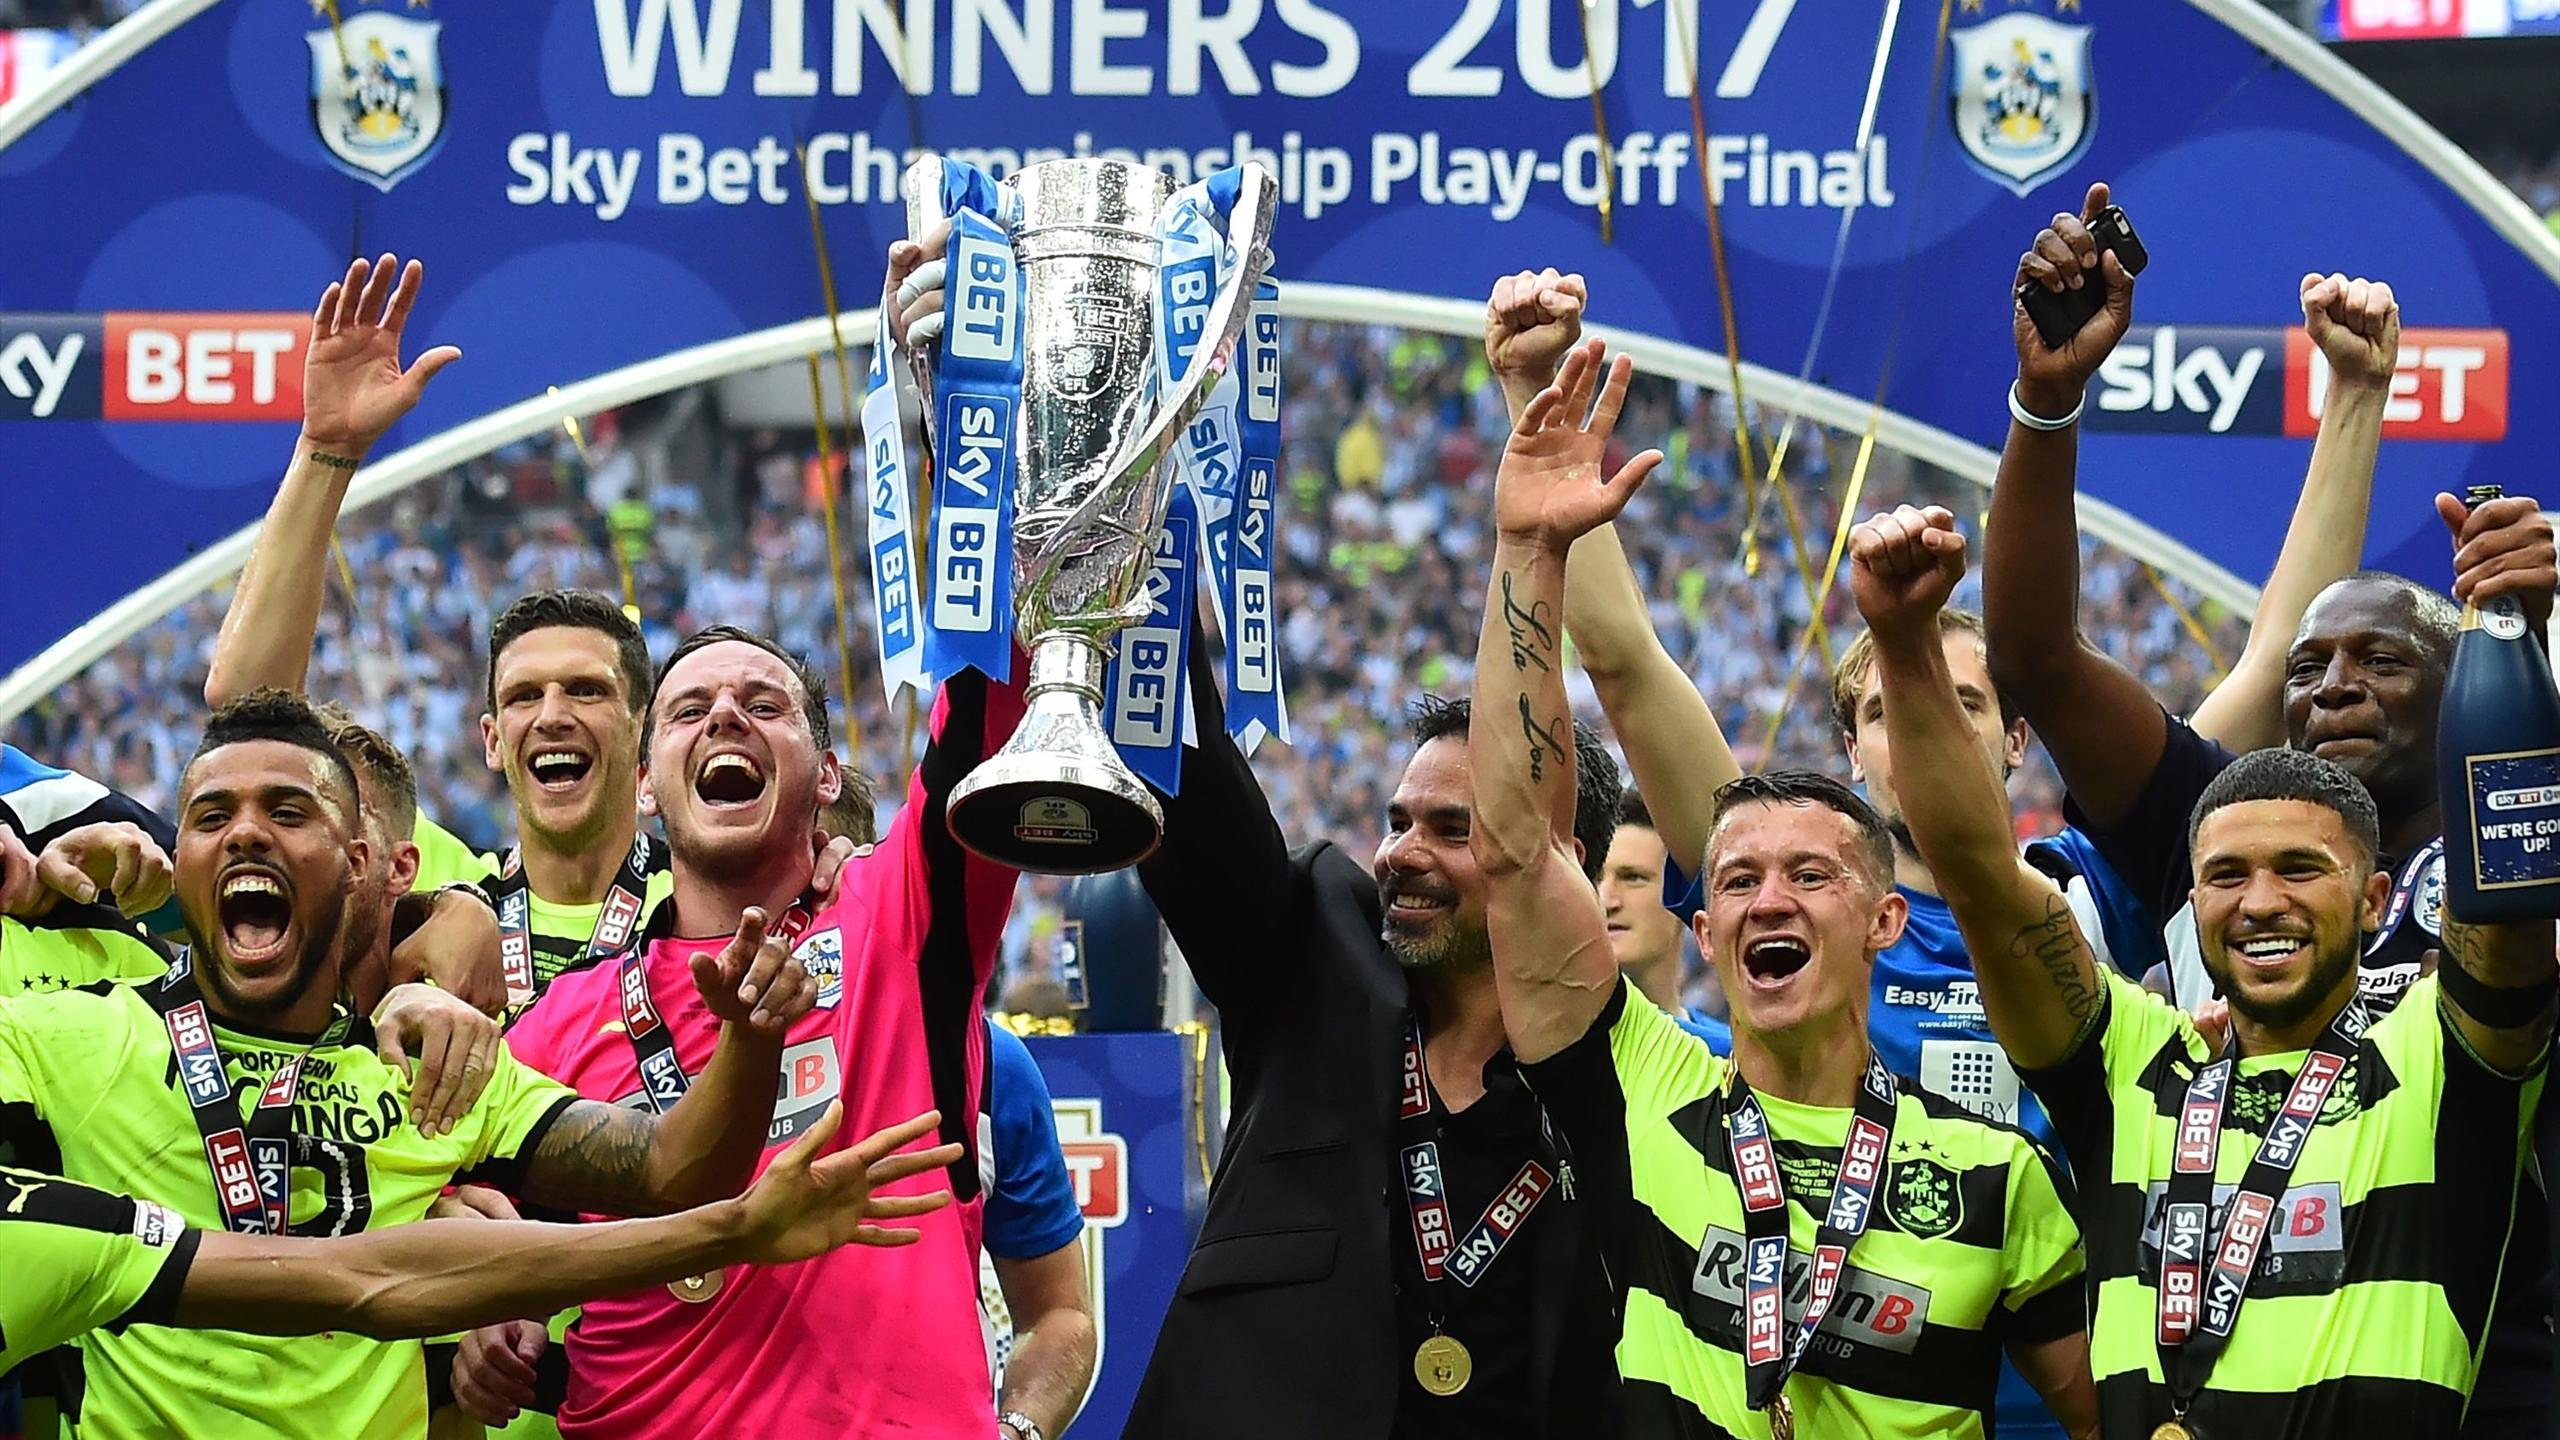 Huddersfield won the playoffs last season